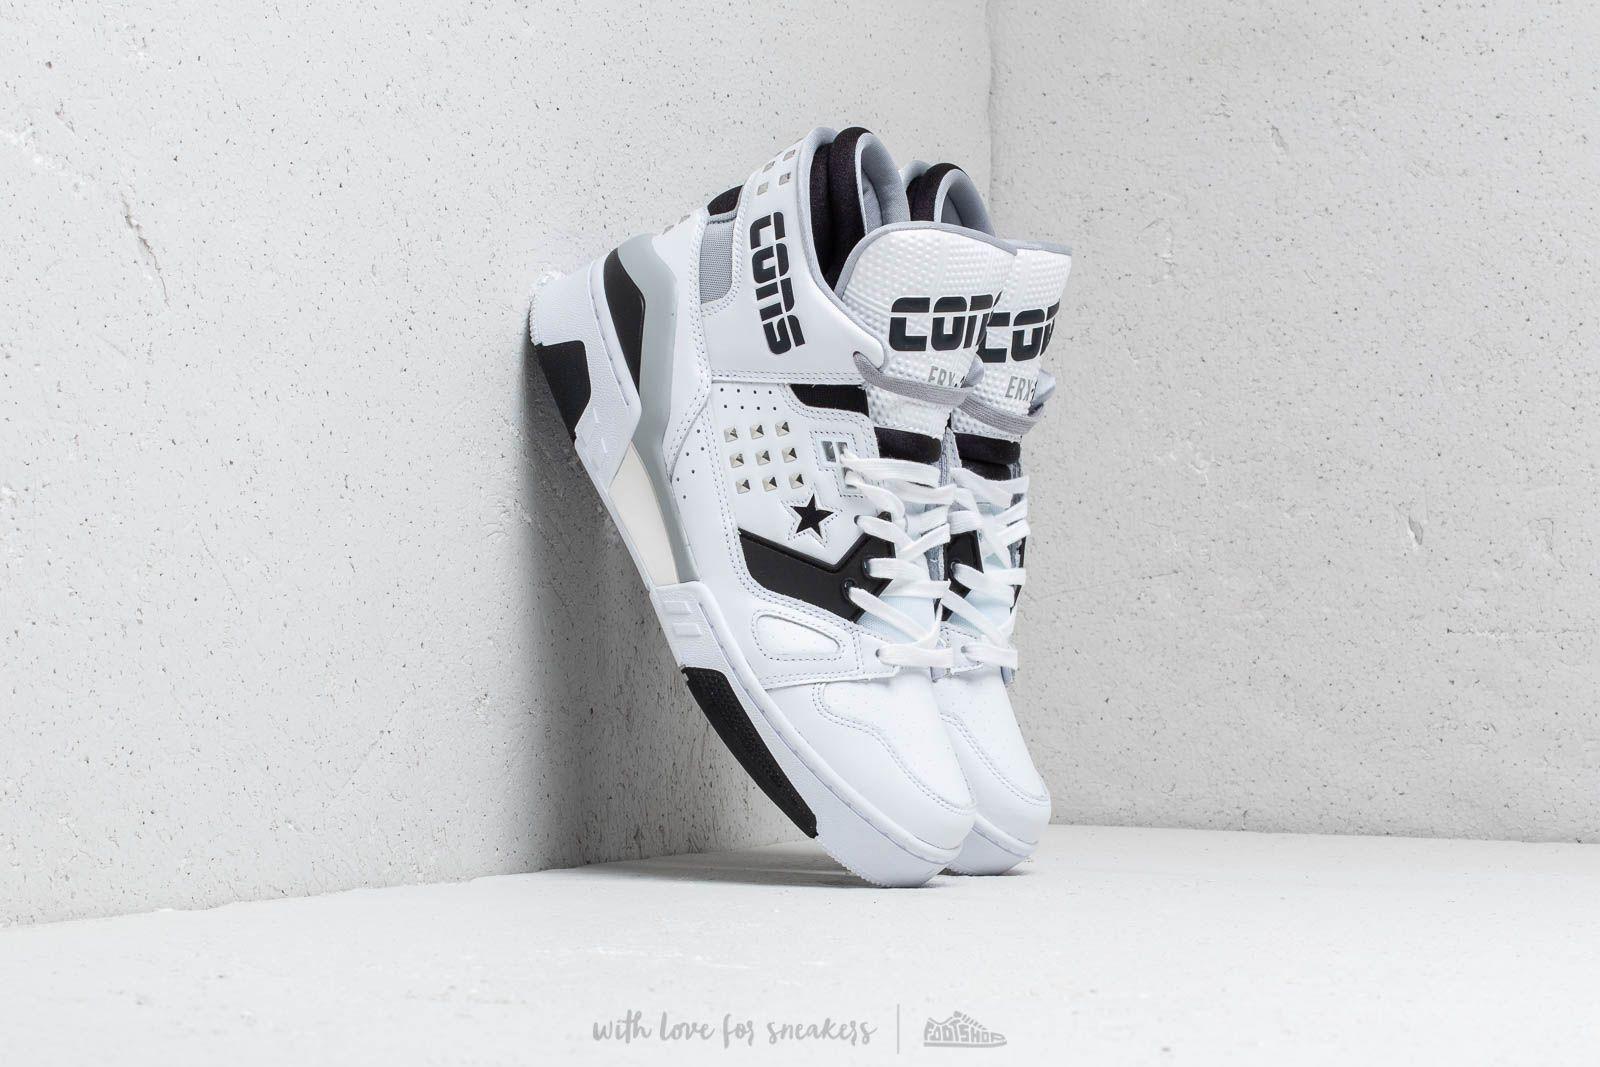 Converse x Don C ERX 260 Mid White/ Black/ Mouse za skvelú cenu 121 € kúpite na Footshop.sk